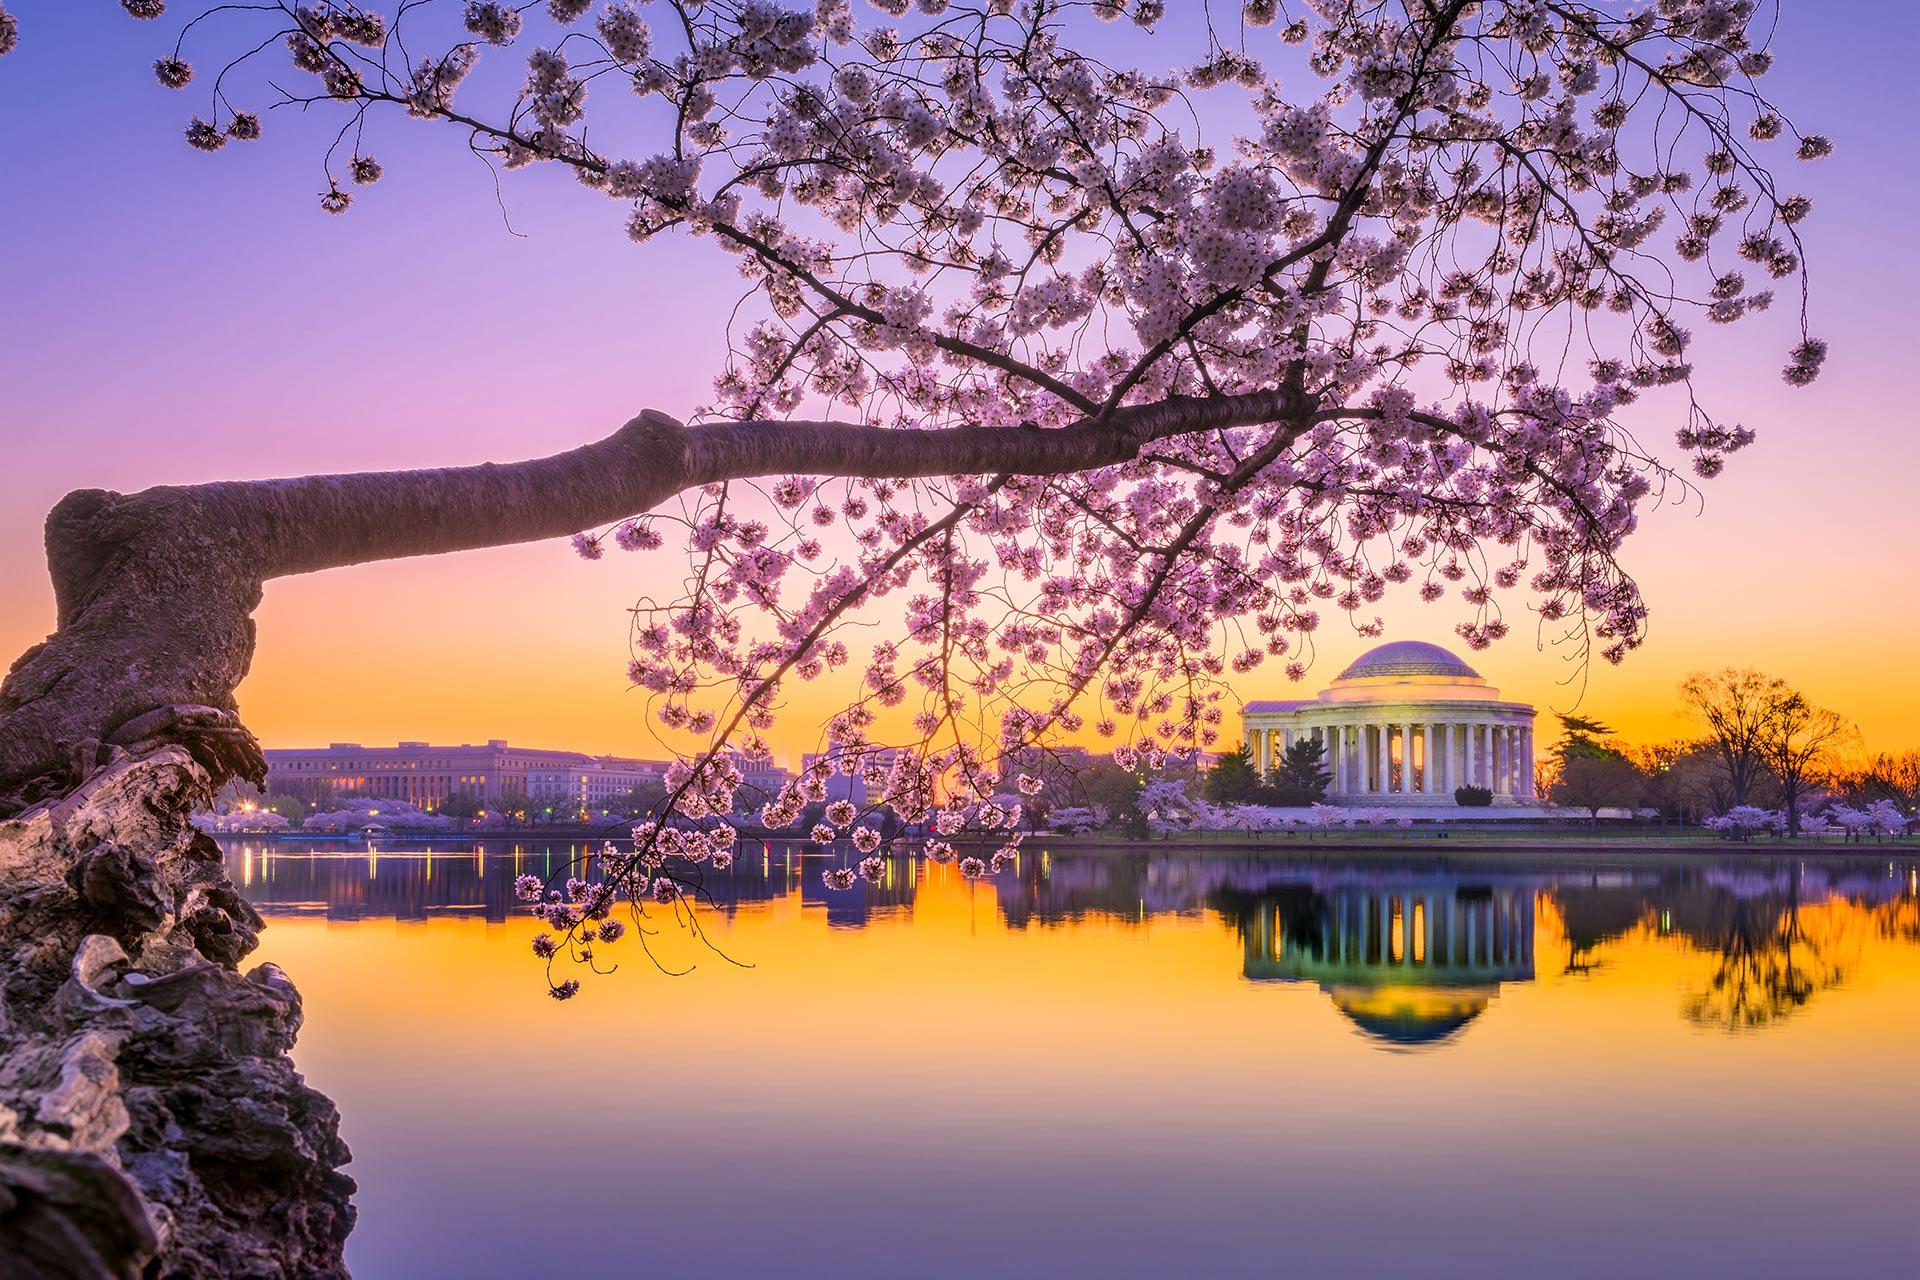 Washington, D.C. at the Jefferson Memorial during spring.